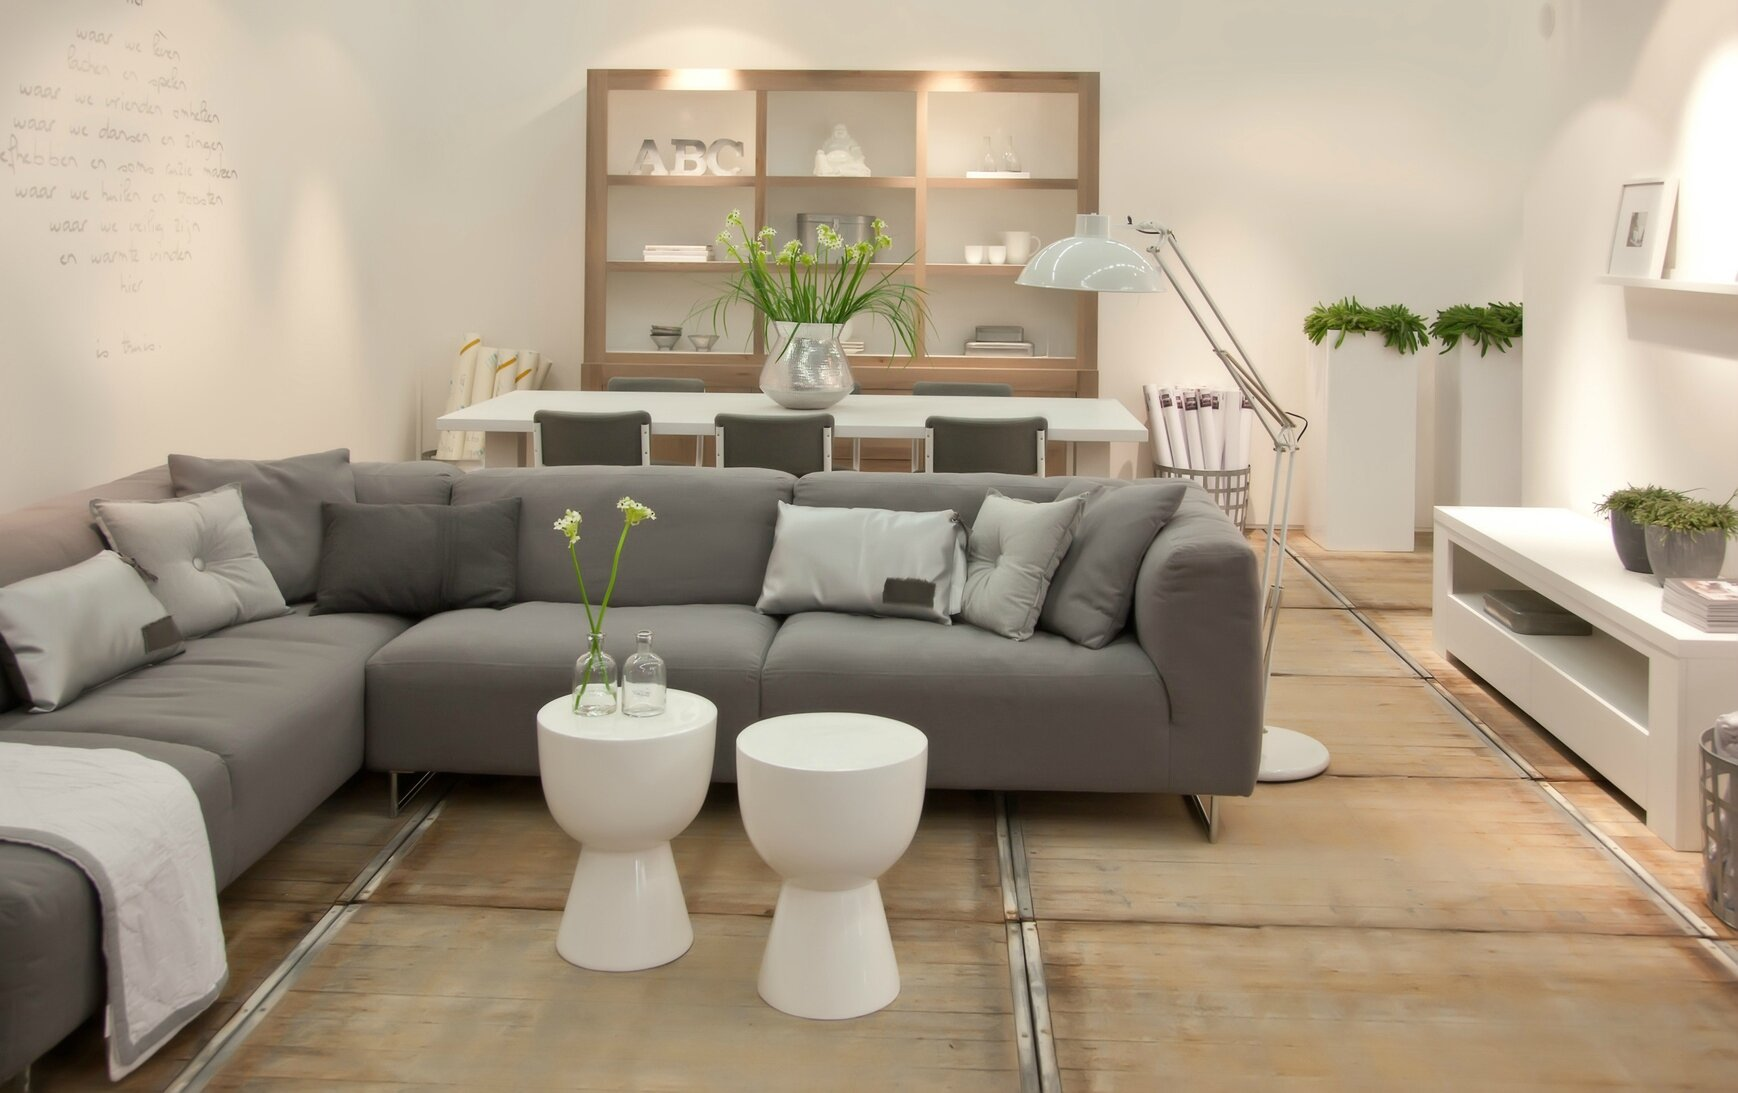 Salon Moderne  Photo De Déco Salon  So Lovely Home